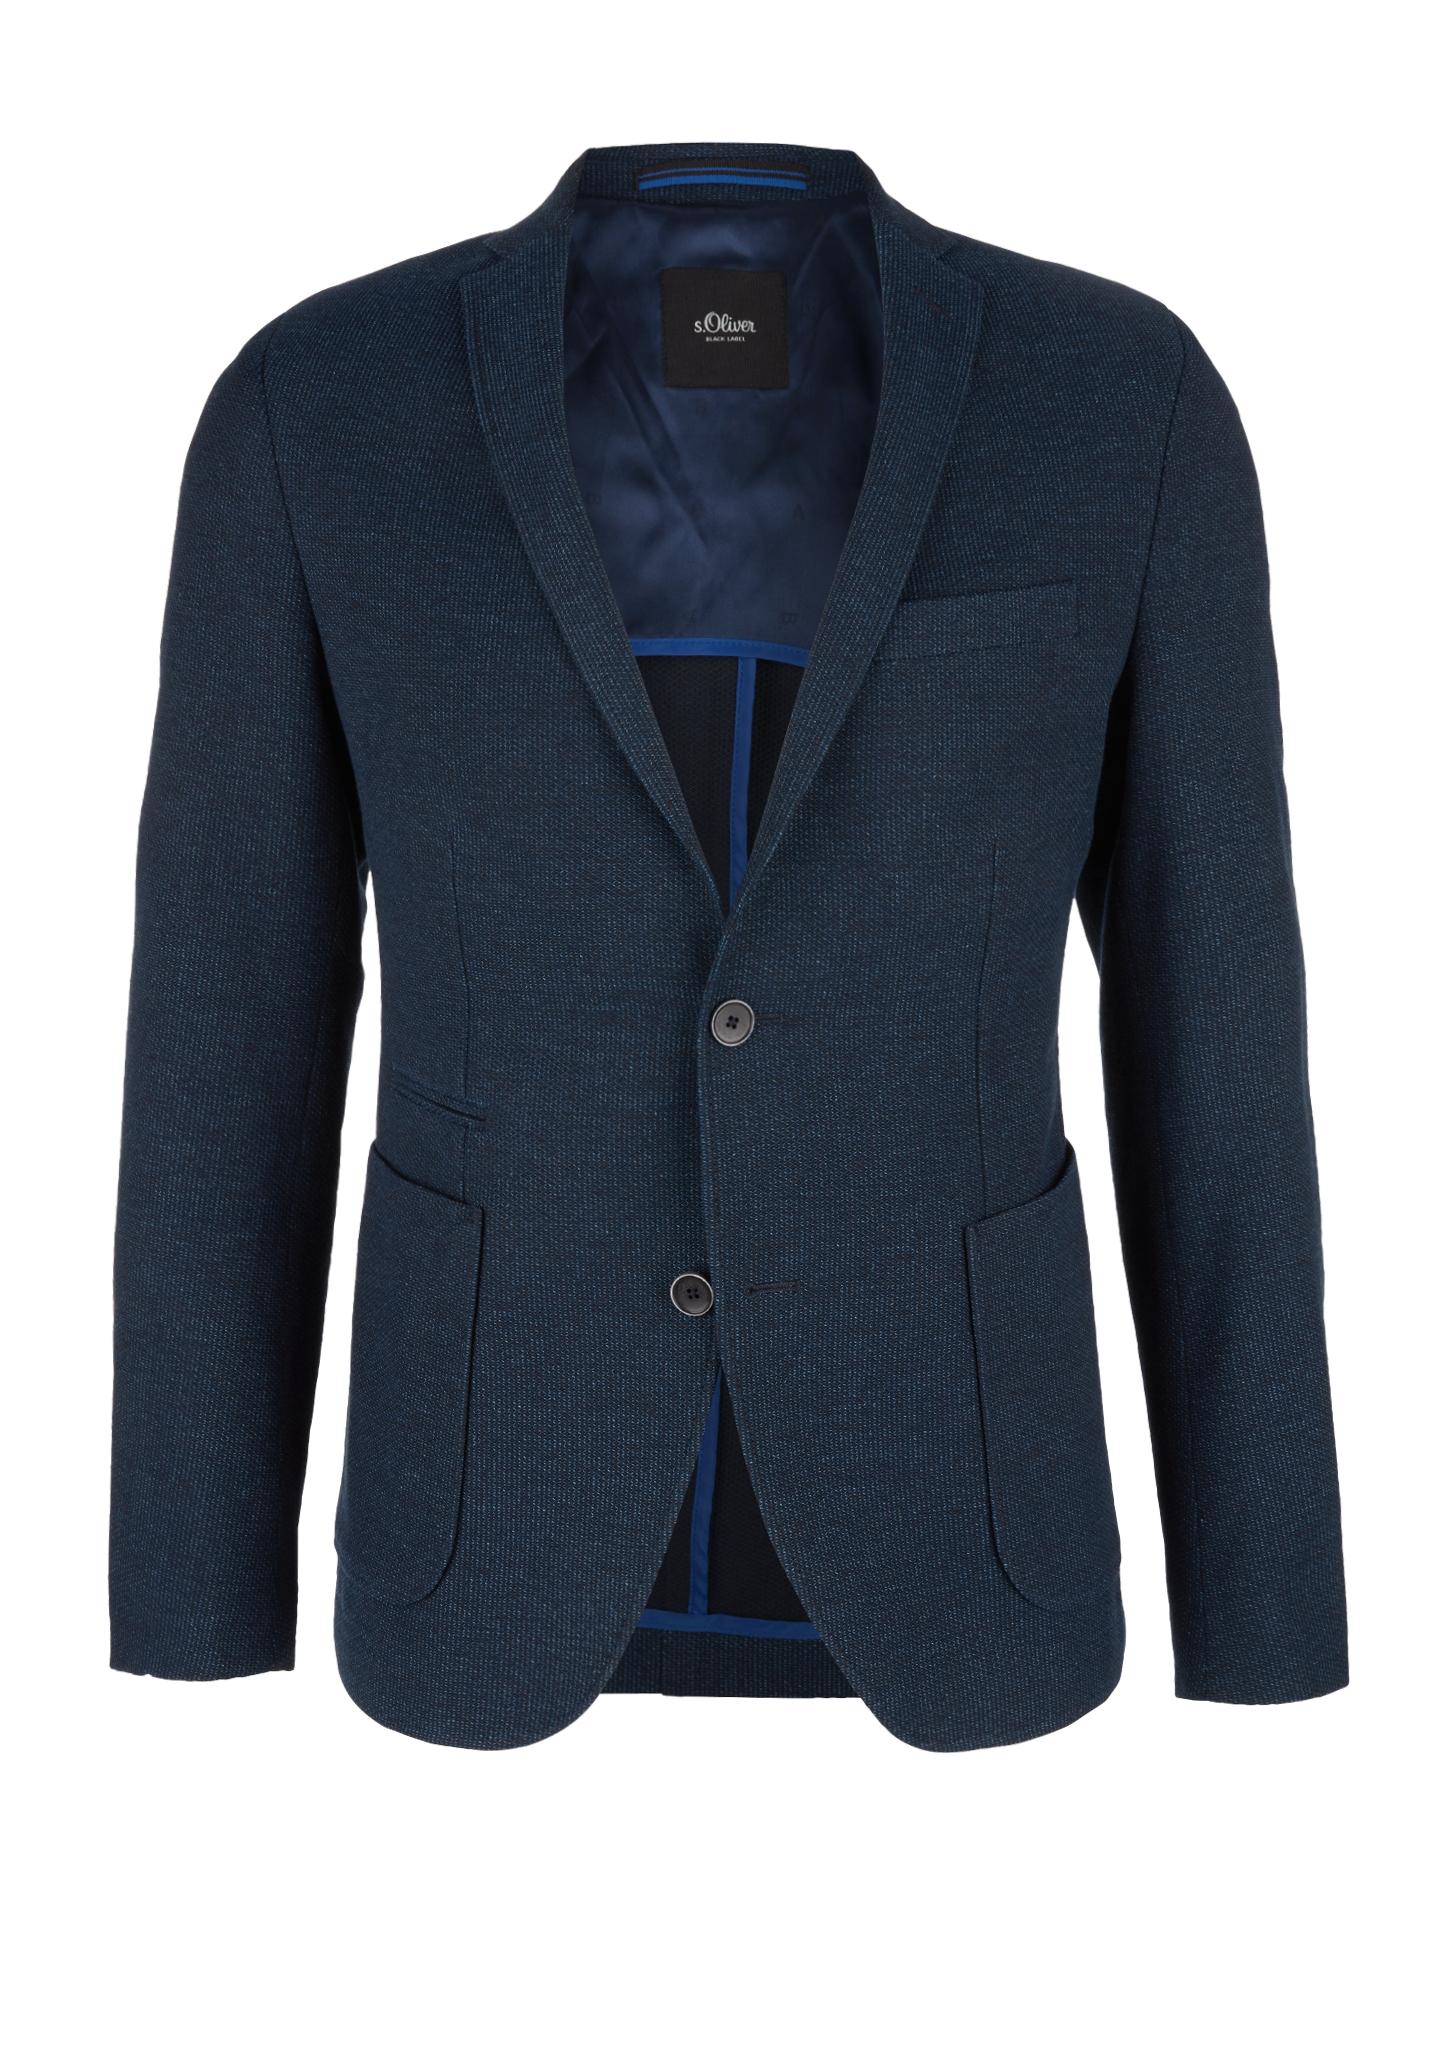 Sakko | Bekleidung > Sakkos | Blau | Oberstoff: 73% baumwolle -  27% polyester| futter: 100% polyester | s.Oliver BLACK LABEL